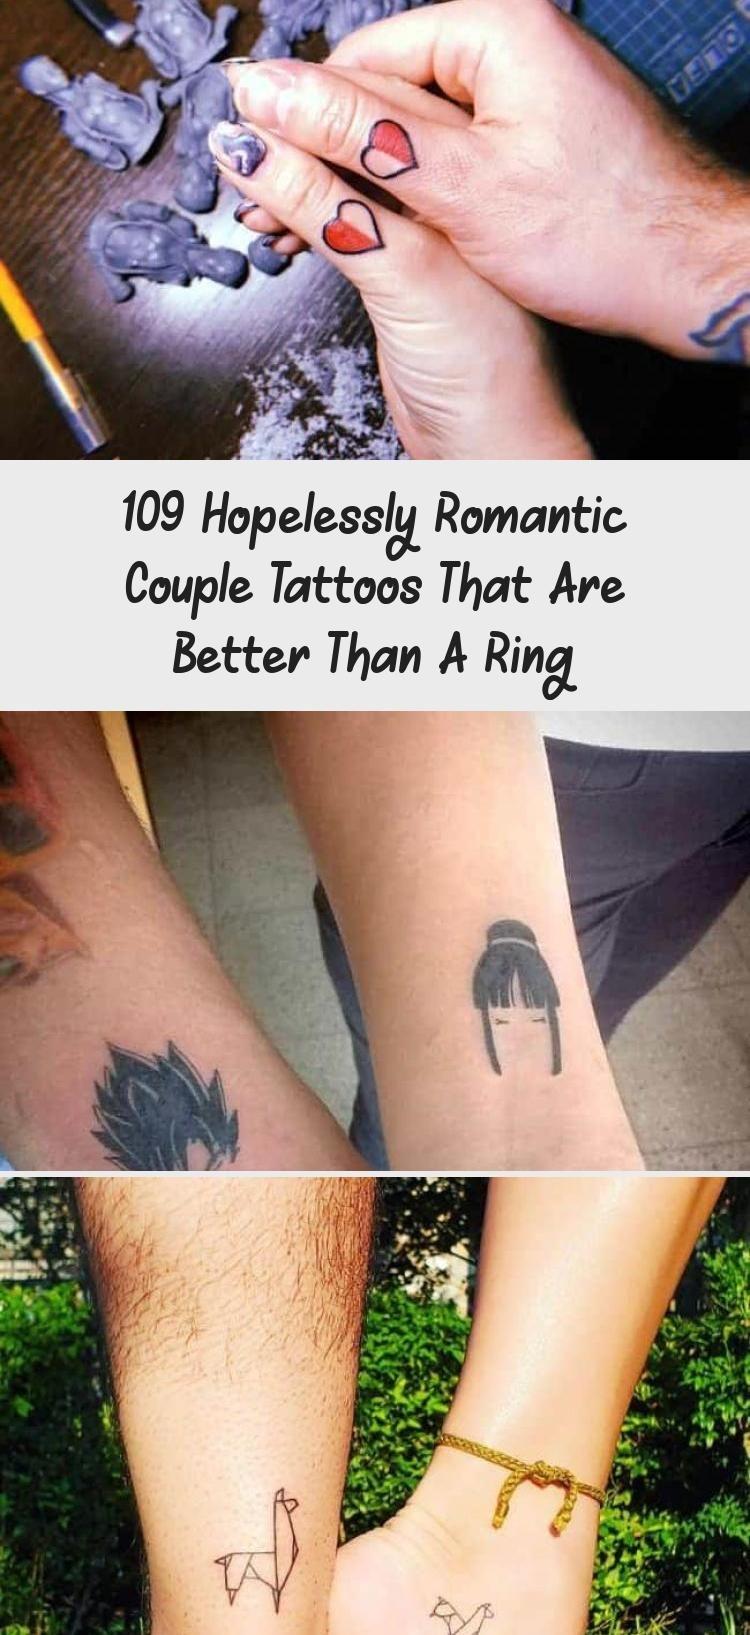 39+ Best Couple tattoo designs on hand image ideas